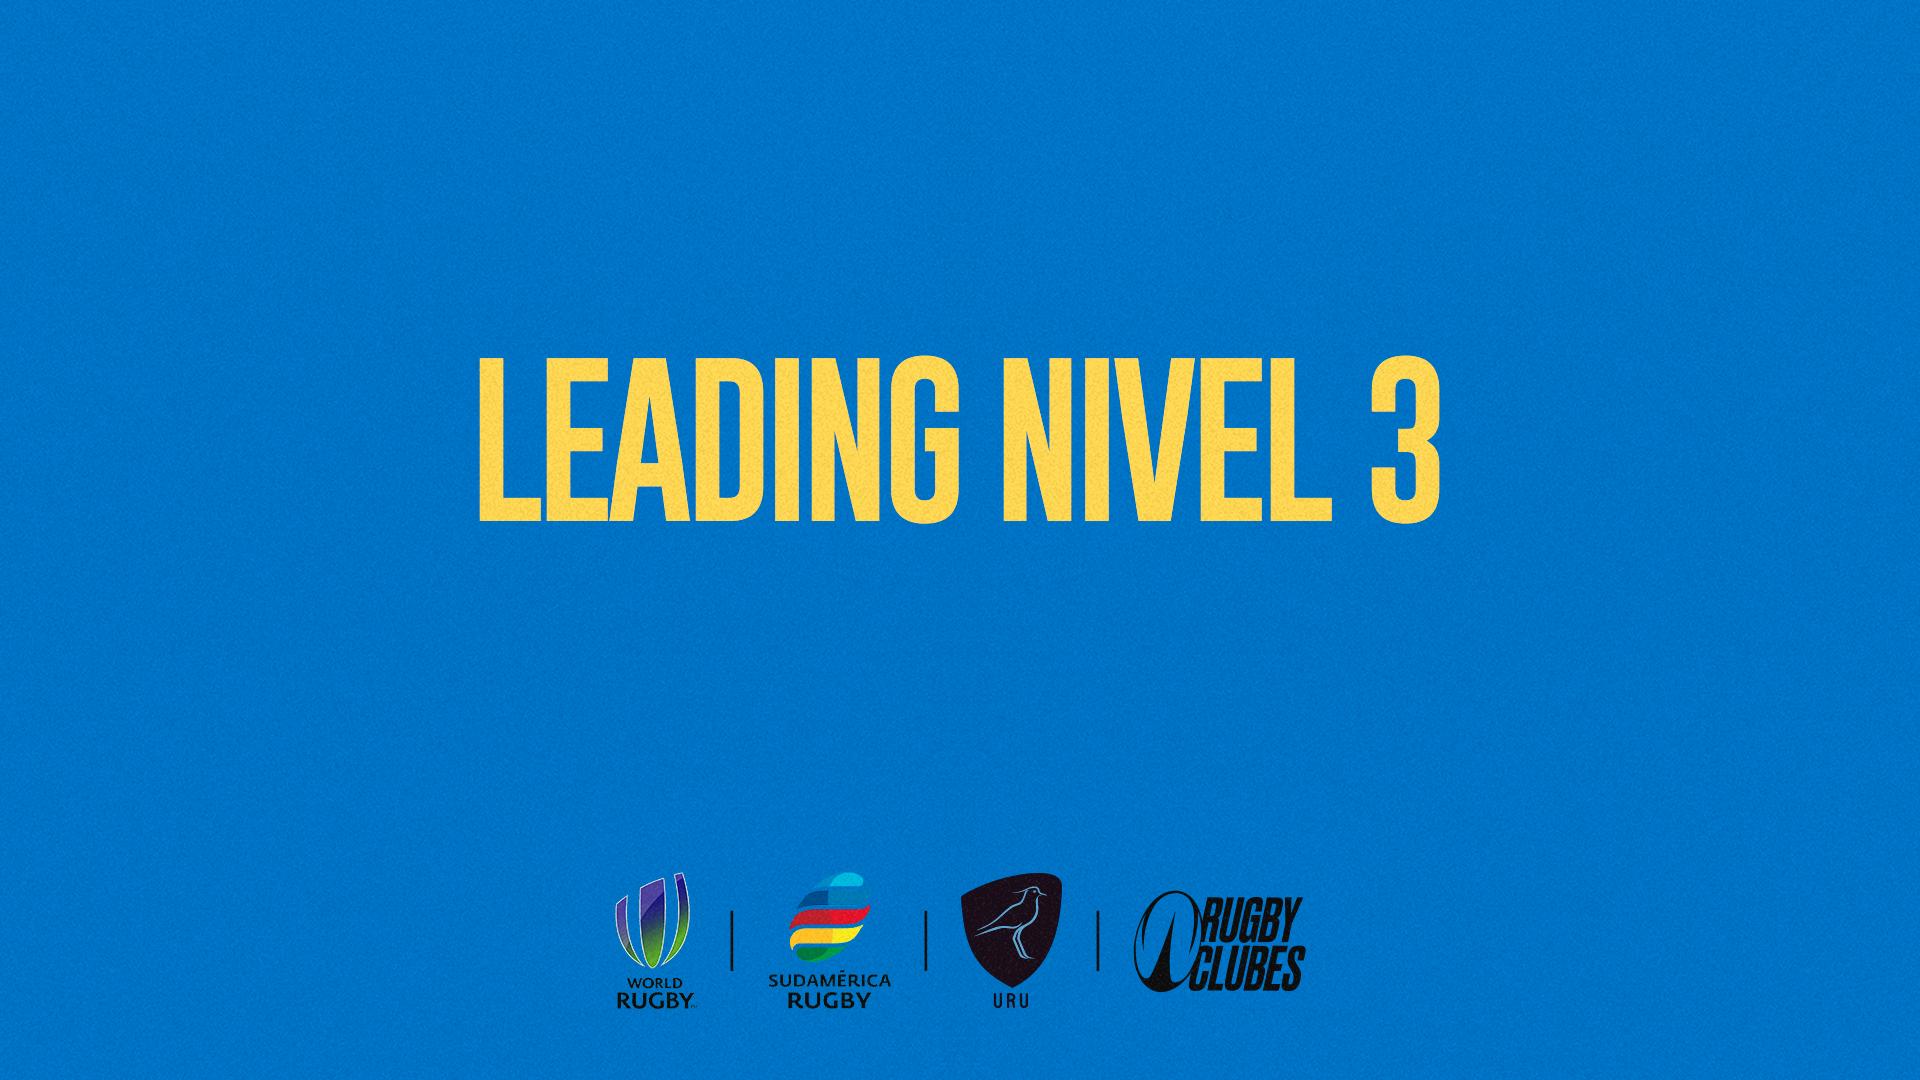 leading nivel 3